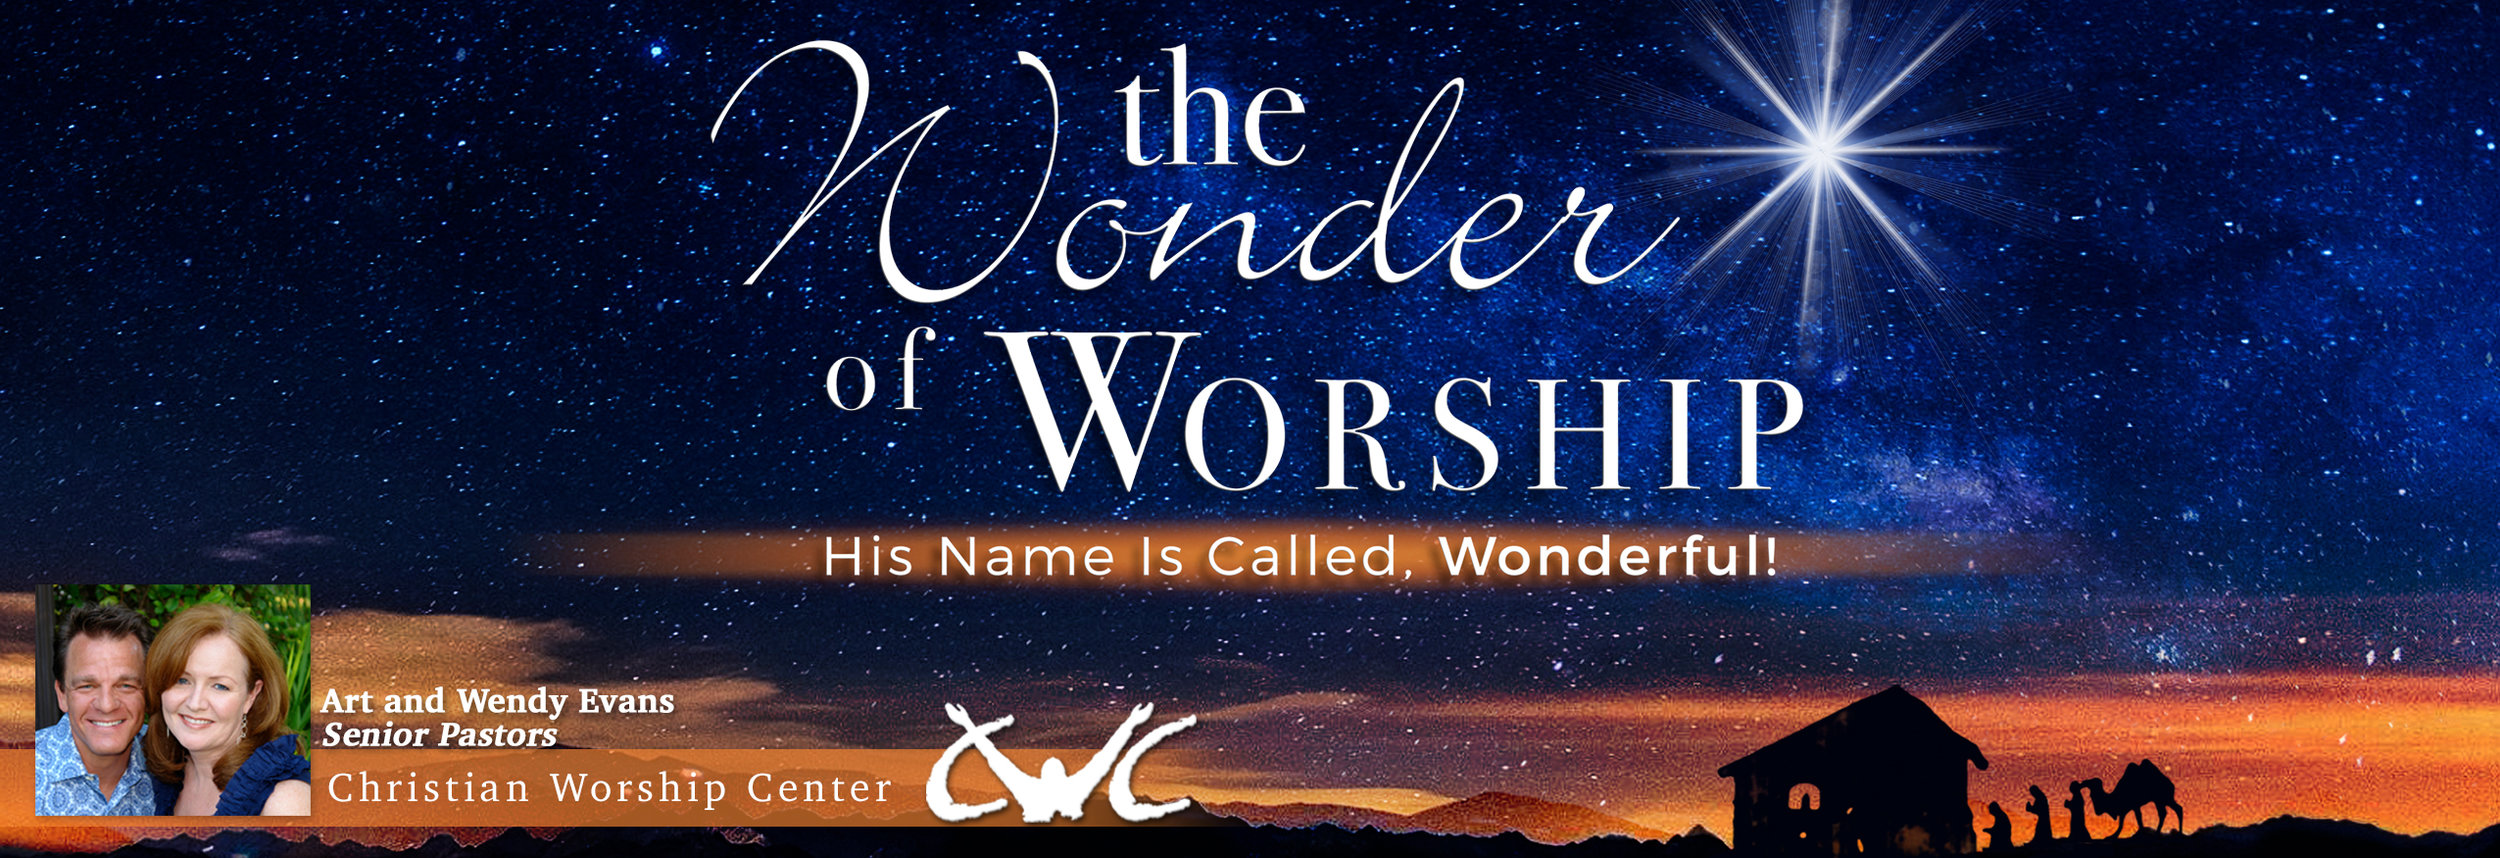 The Wonder of Worship Banner 1.jpg